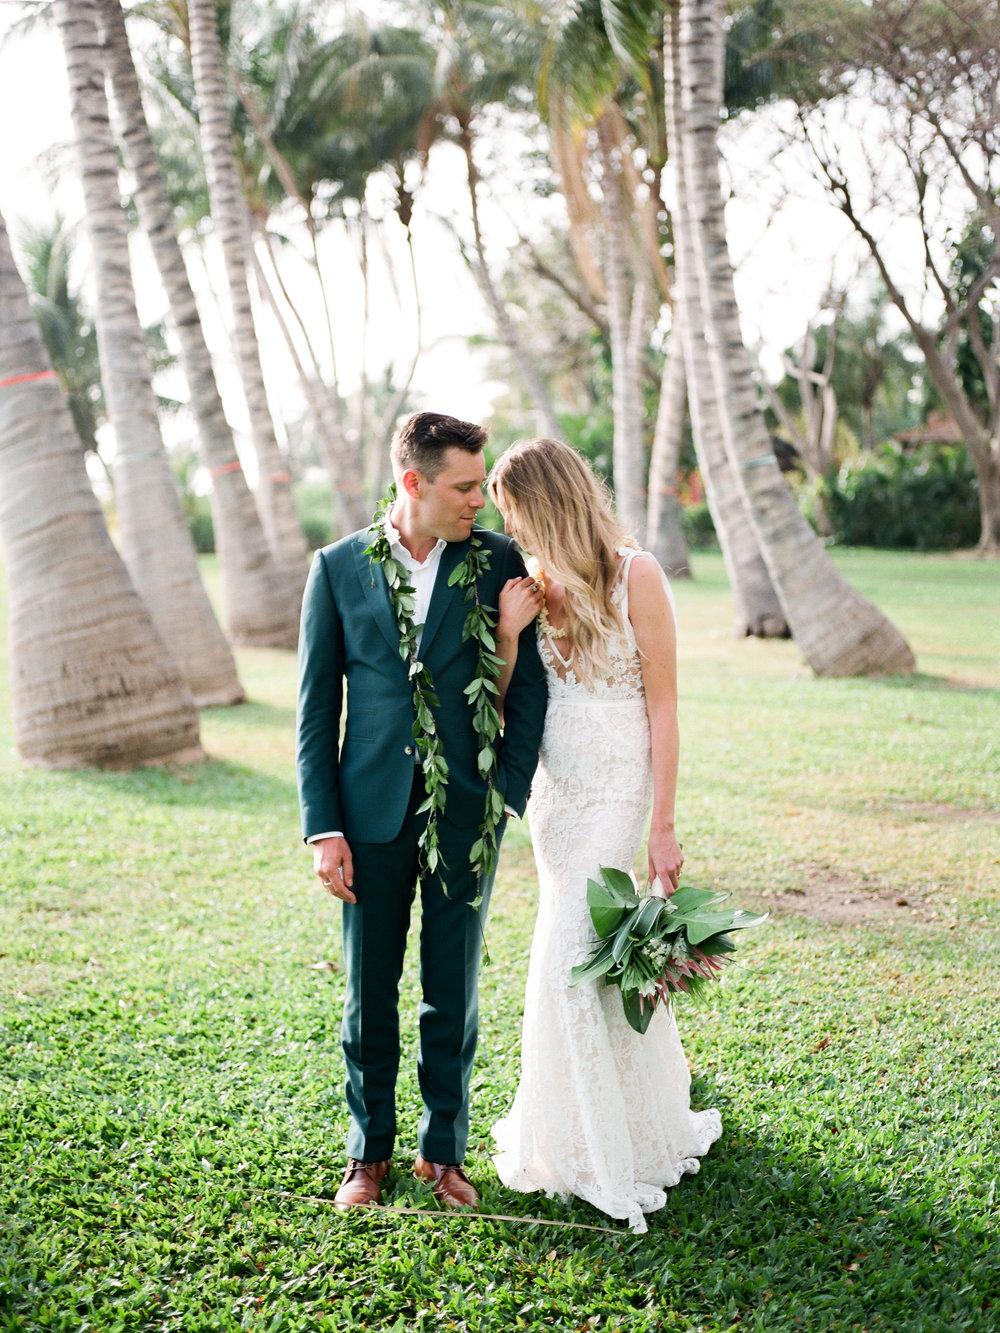 Anna Delores Photography_in collaboration with Rhianna Mercier Photography_Olowalu_Plantation_Wedding_tropical_Maui-2017.jpg